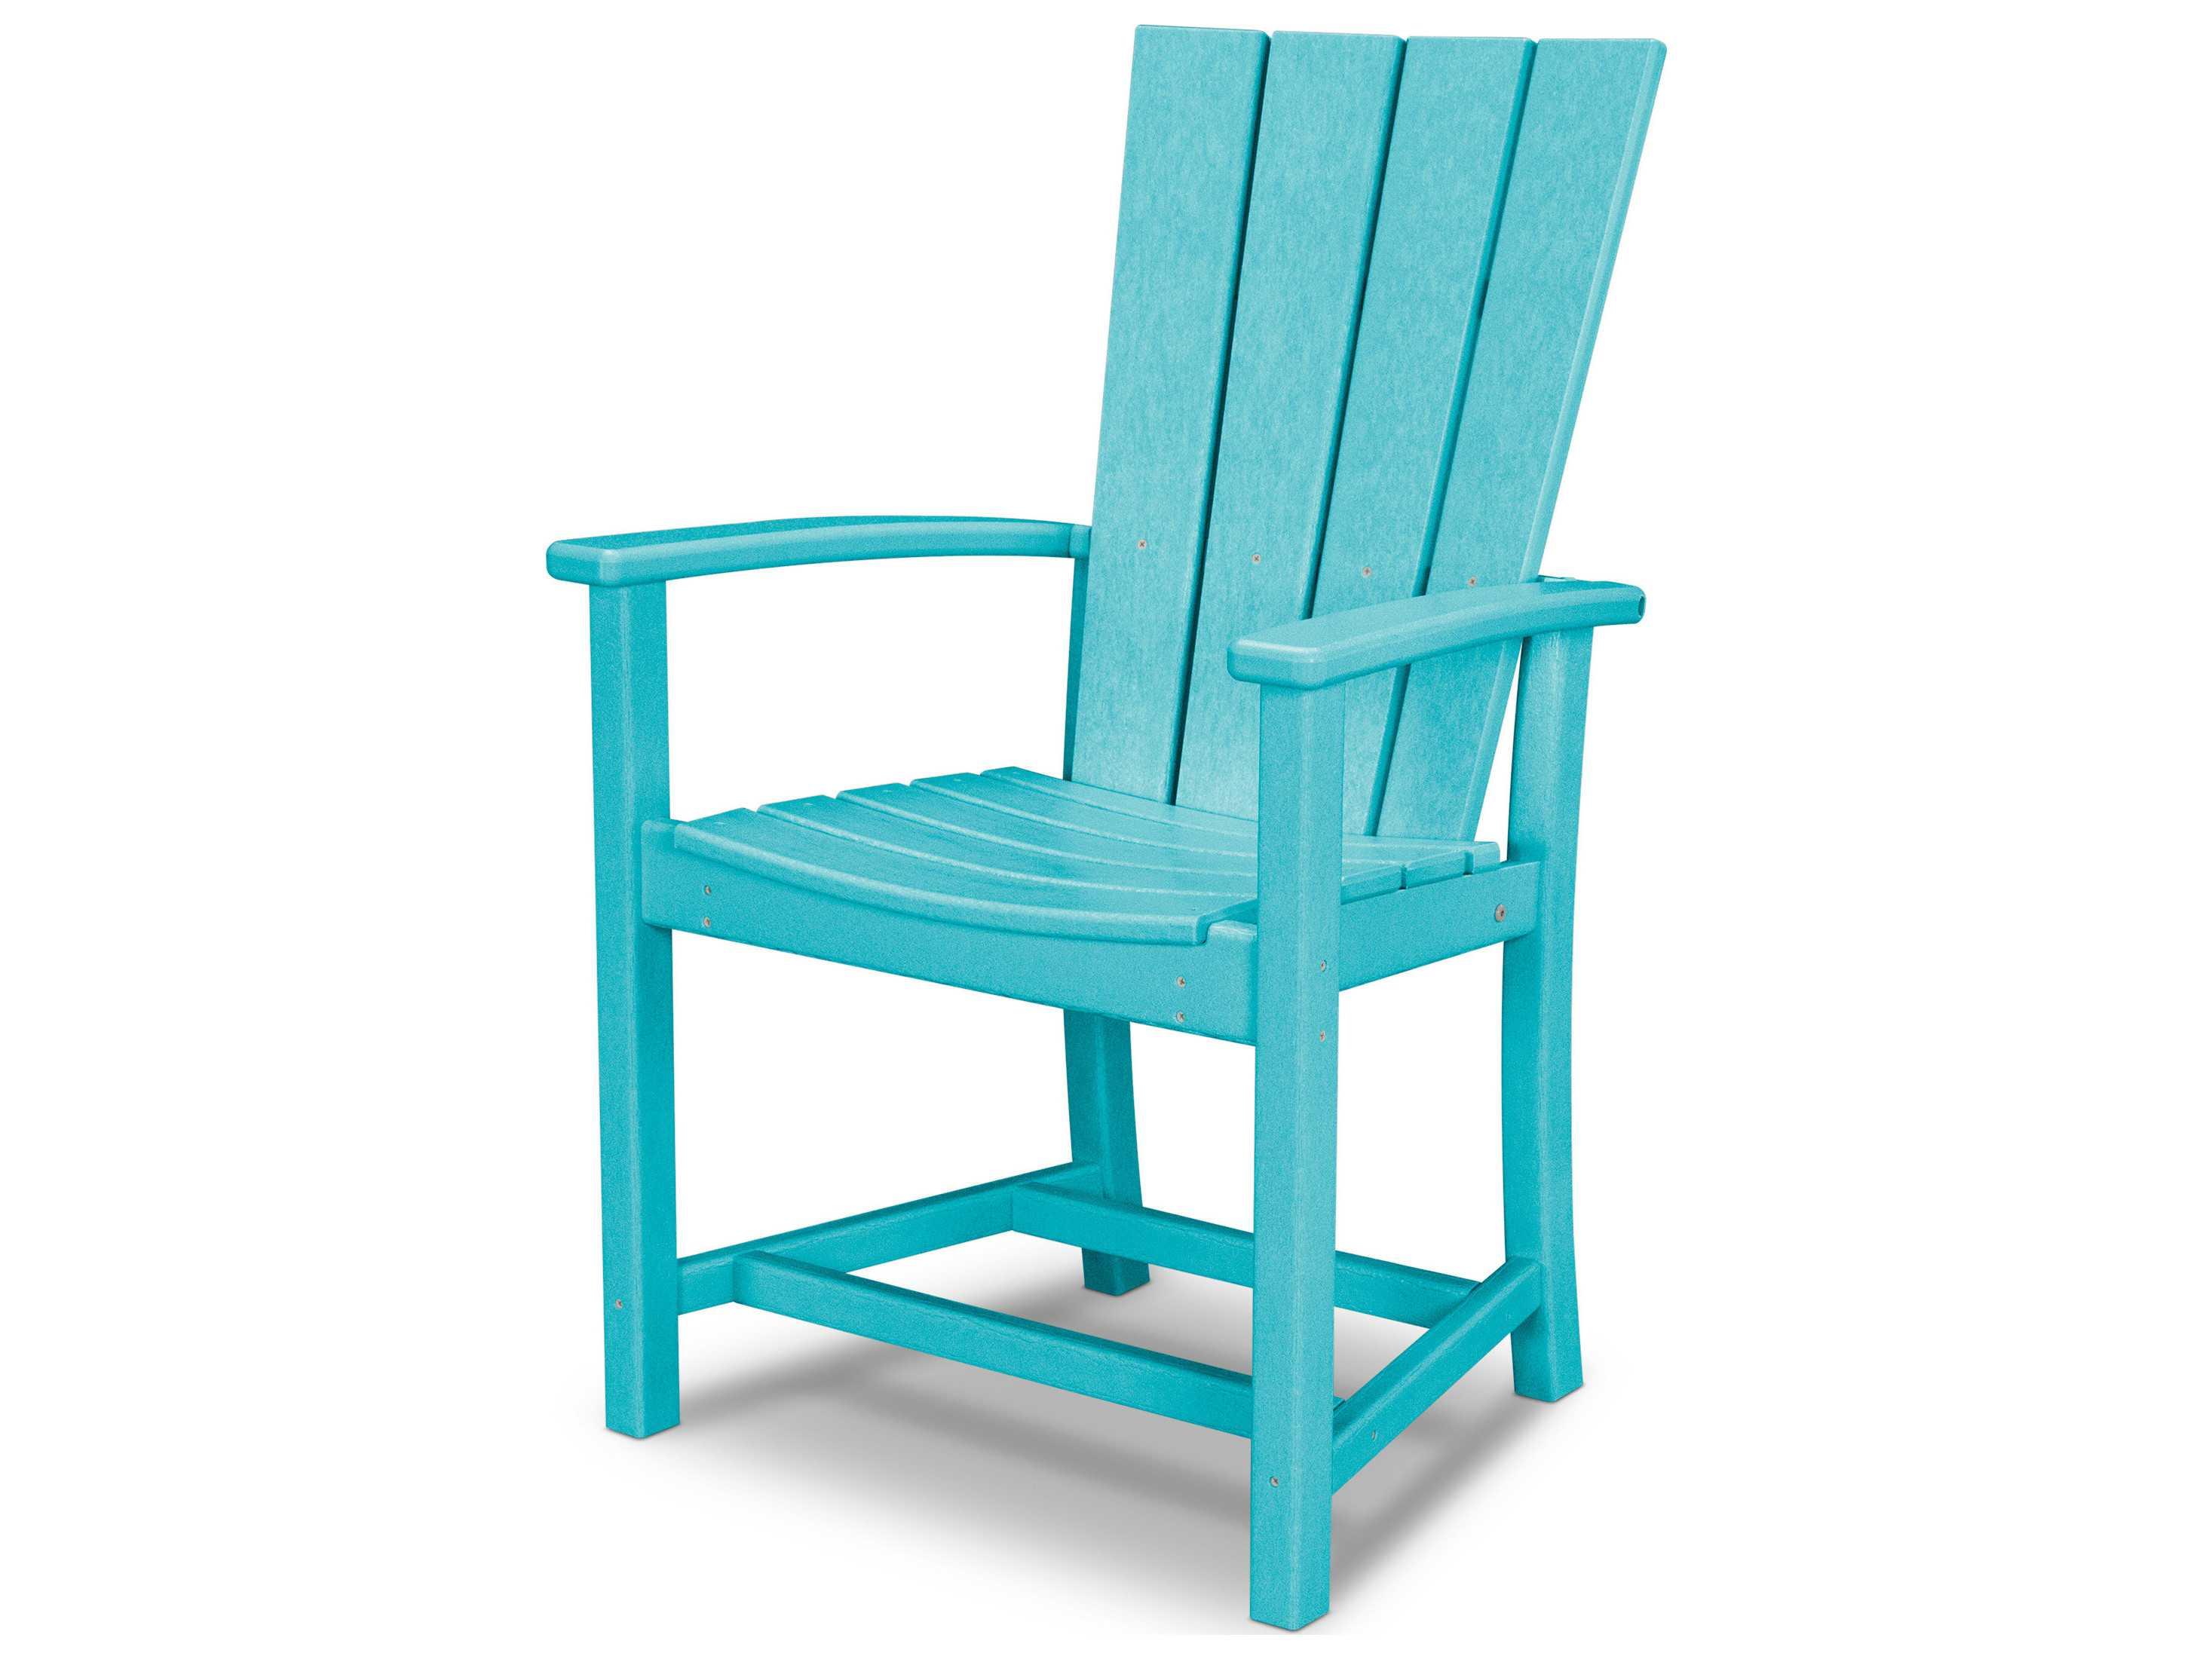 Polywoodr Quattro Recycled Plastic Adirondack Dining Chair